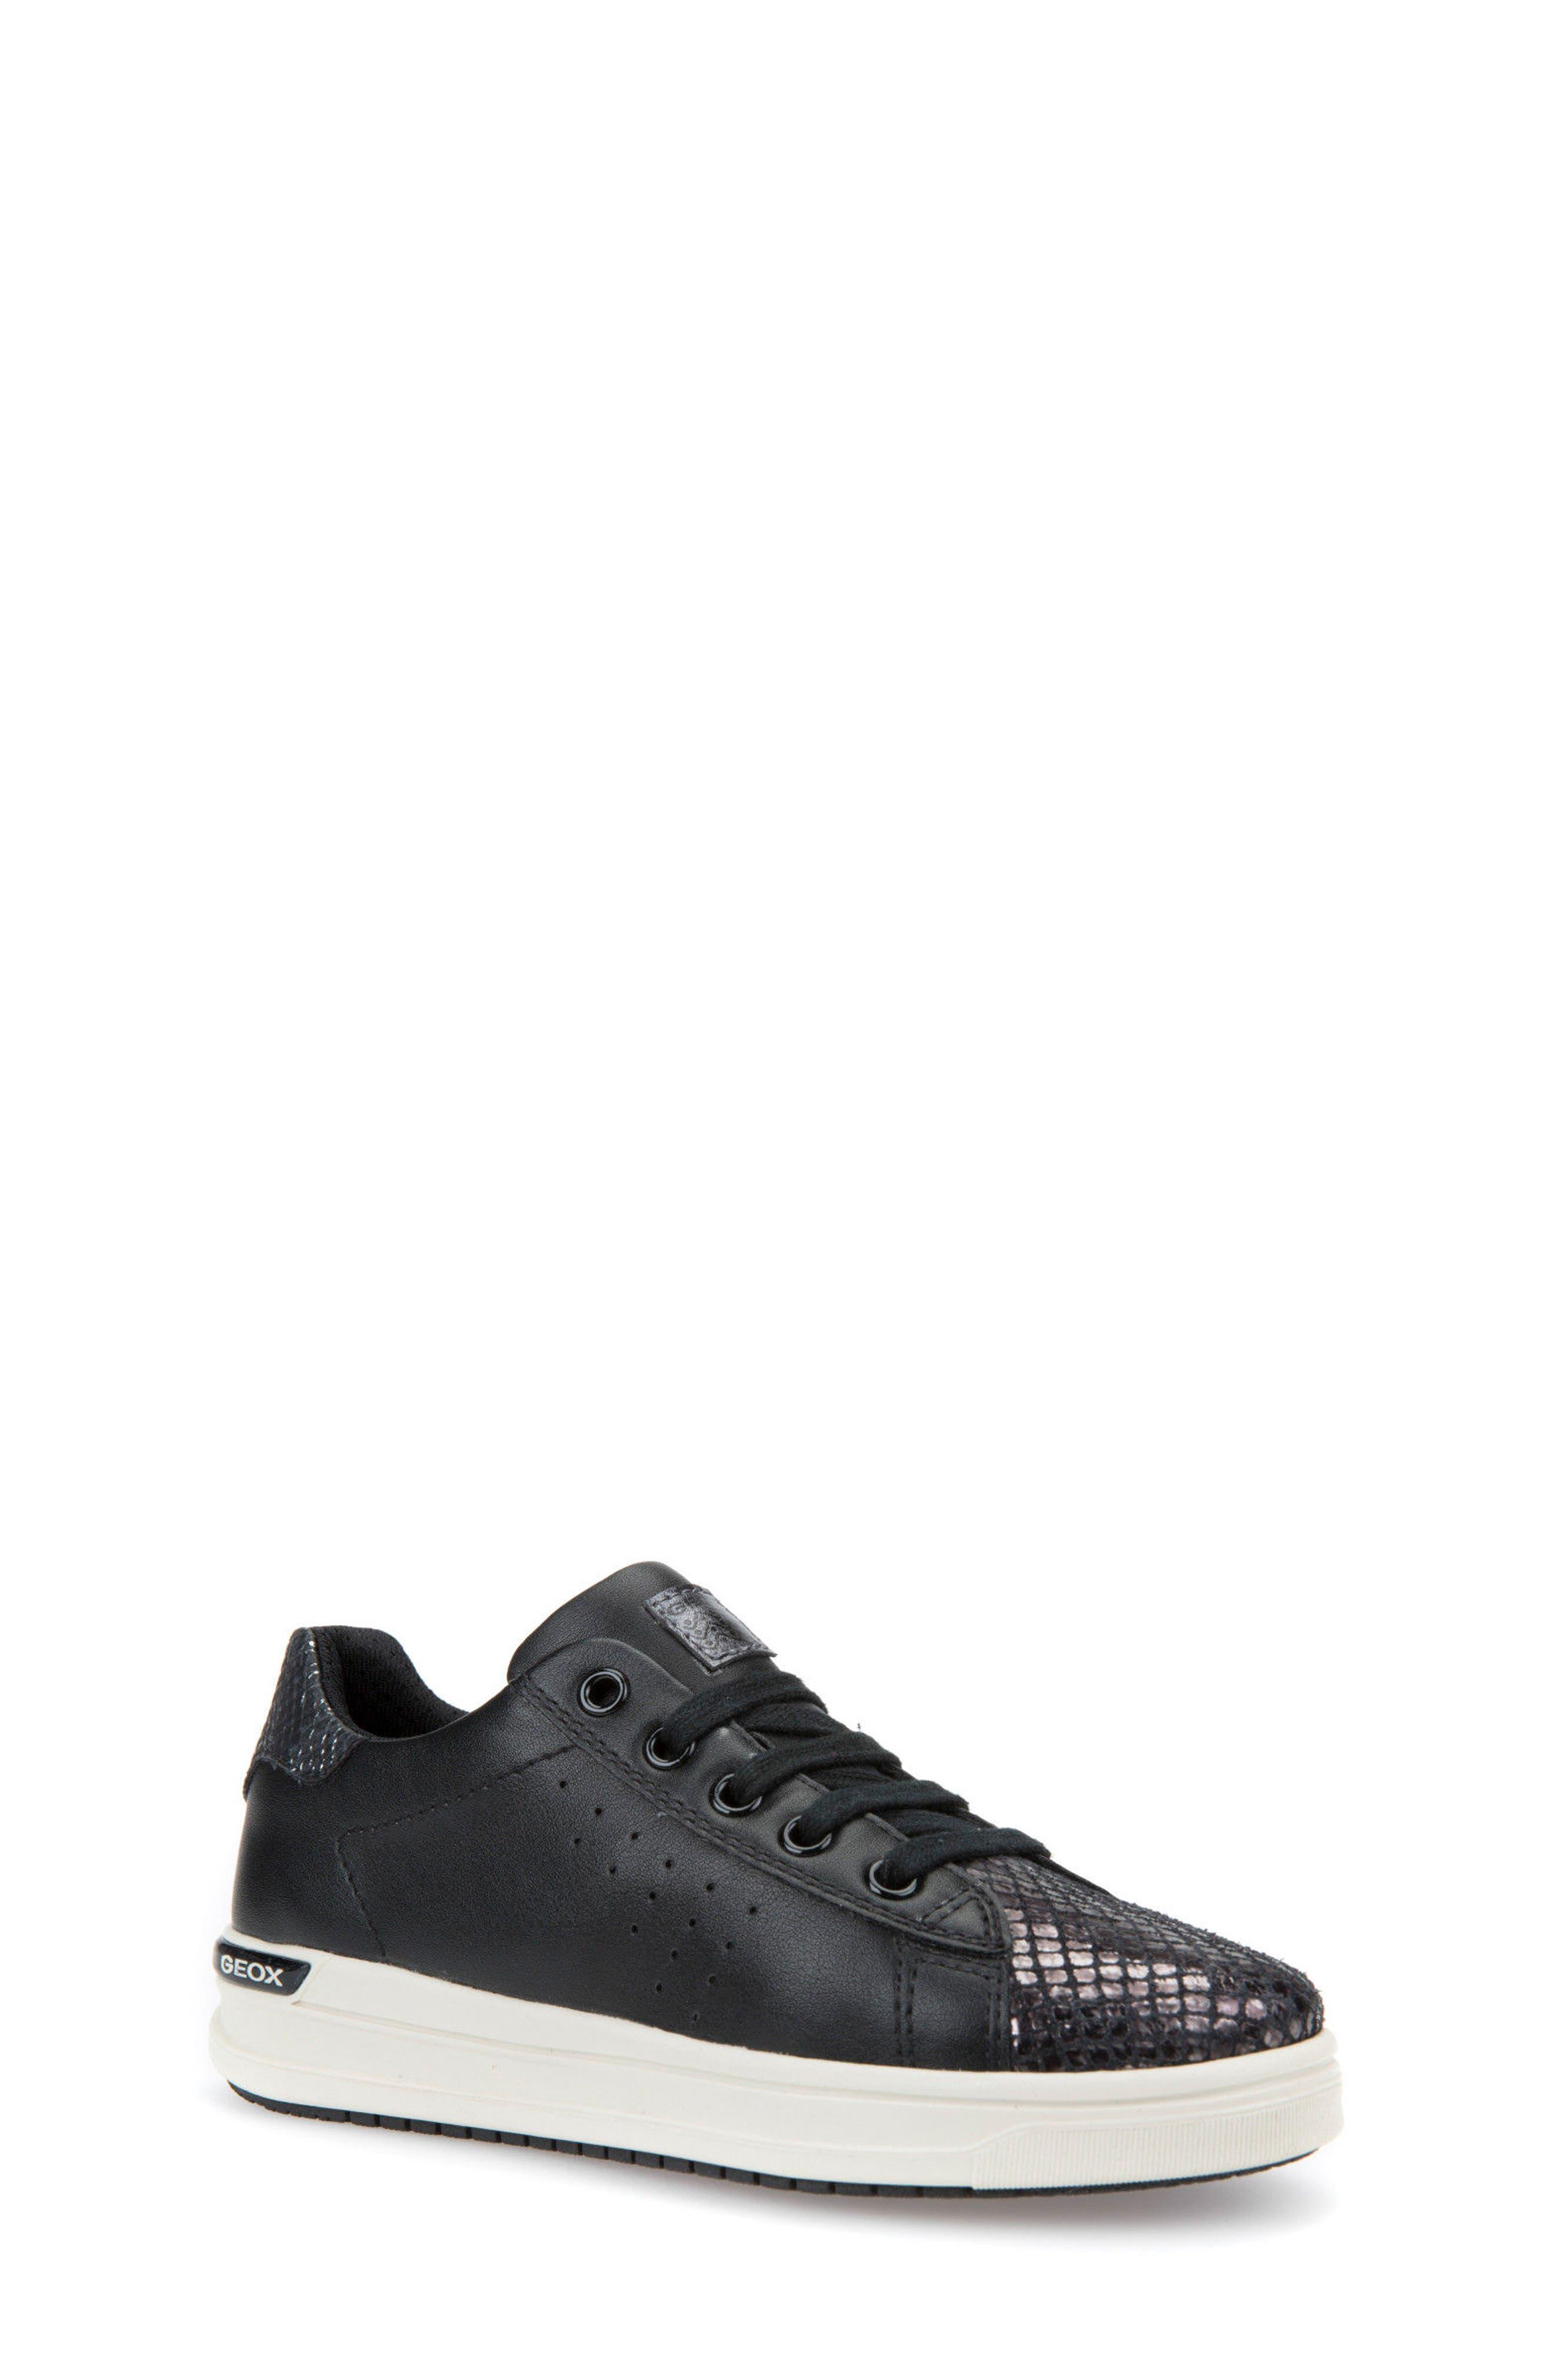 Cave Up Girl Low Top Sneaker,                         Main,                         color, Black